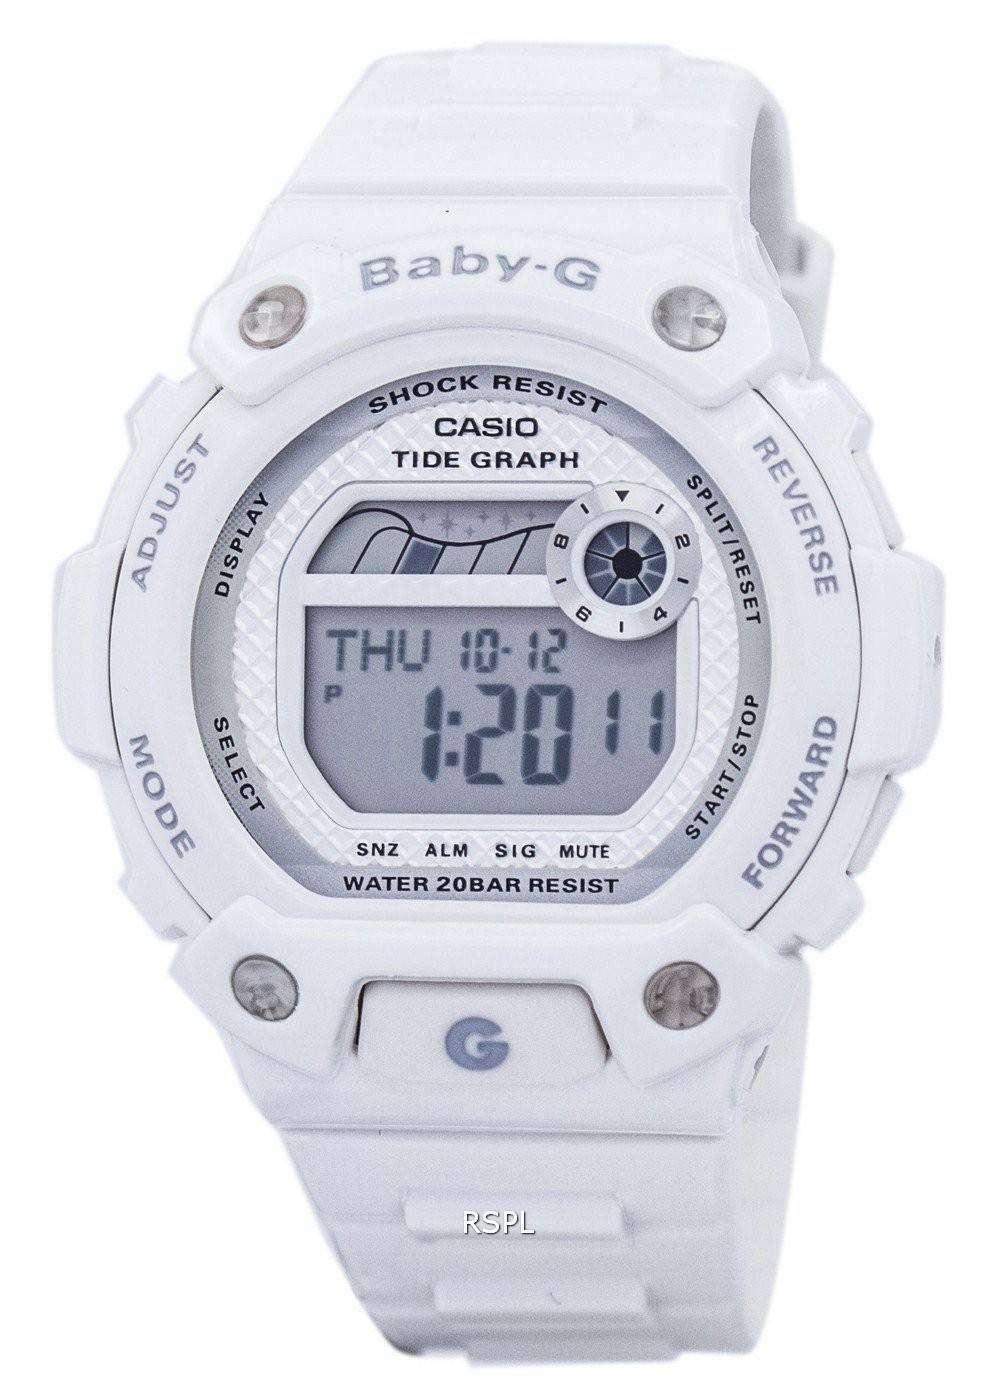 Casio Baby-G Tide Graph Shock Resistant Alarm BLX-100-7E Women s Watch e0c72006637b